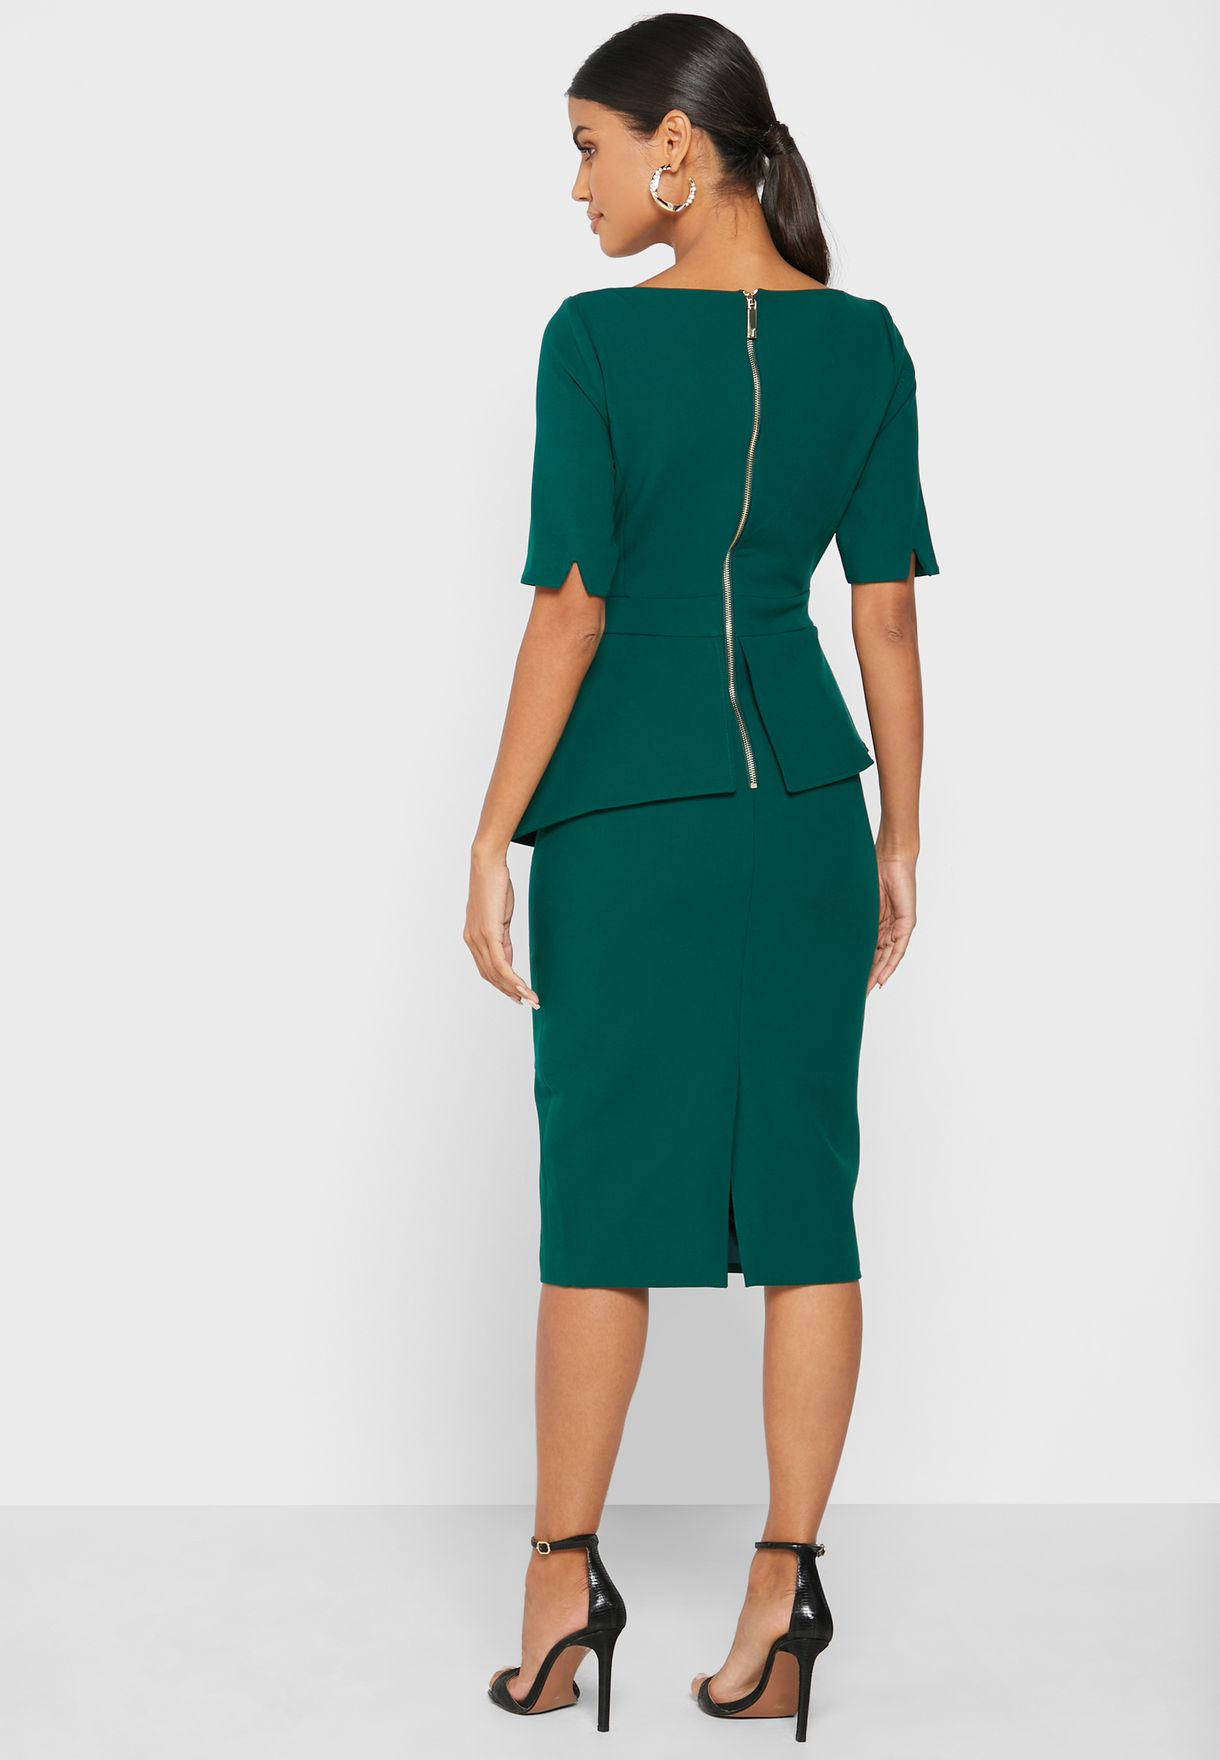 Romolaa Peplum Detail Dress